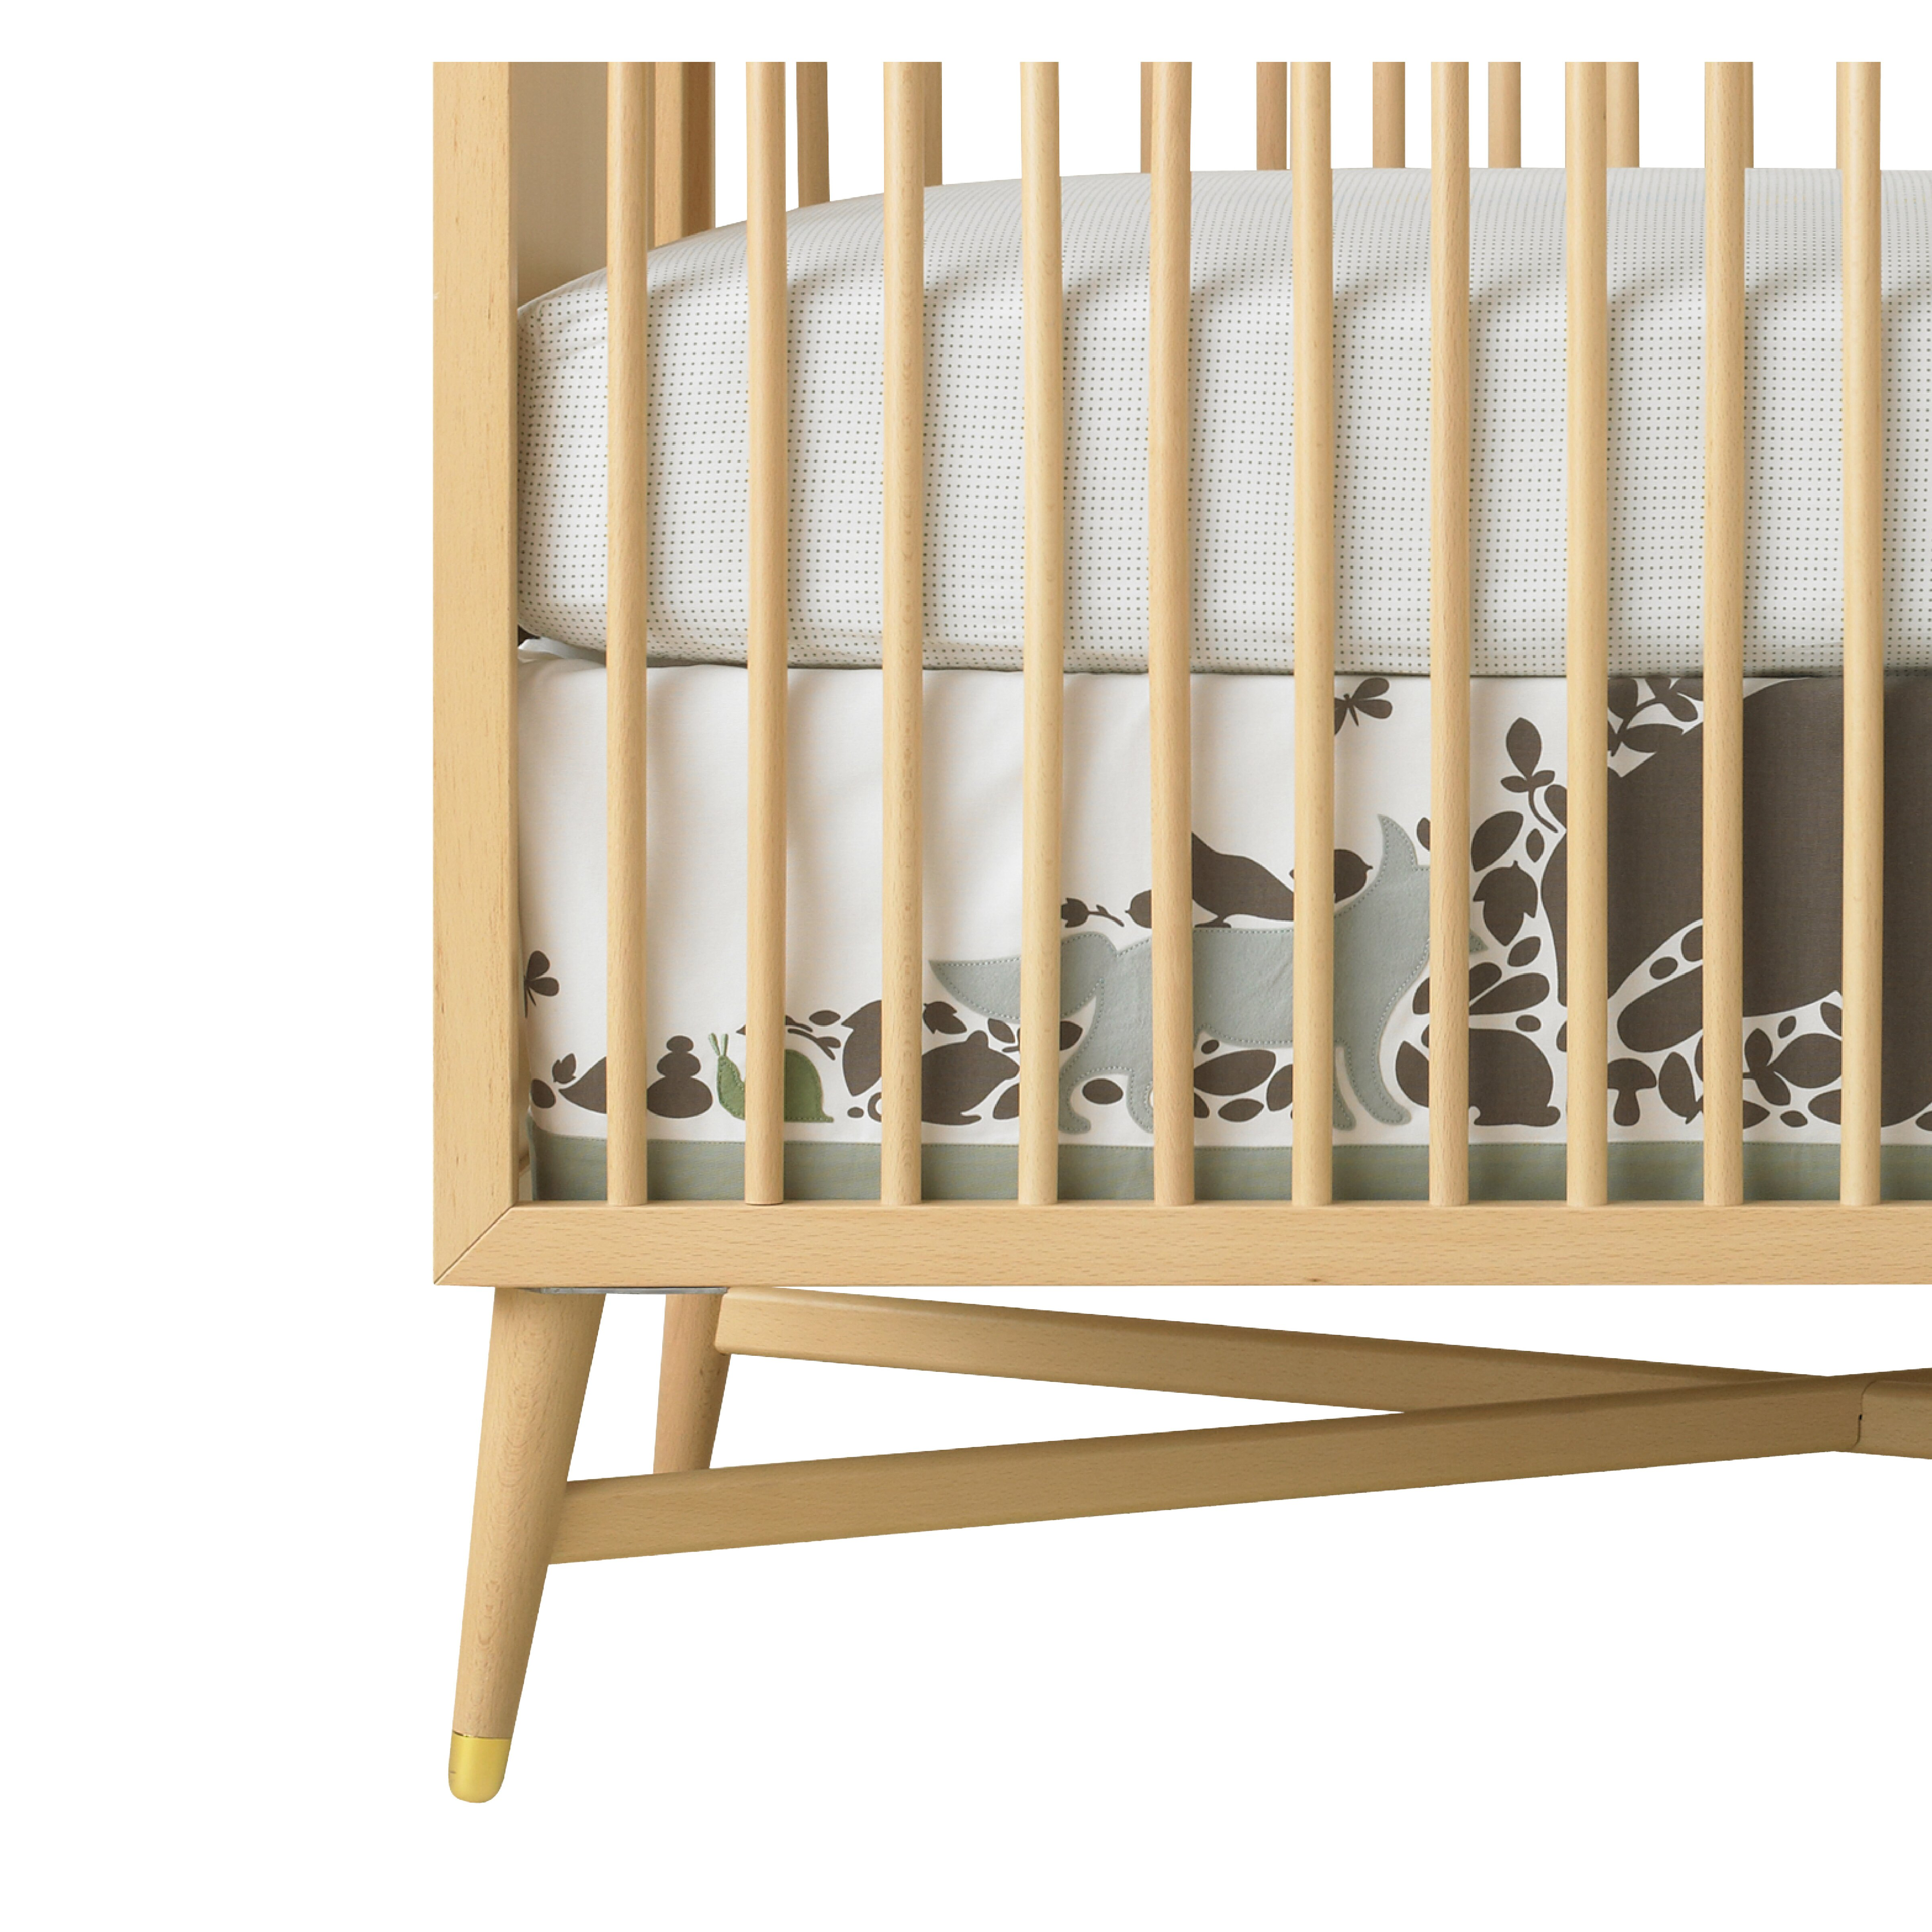 Baby cribs lexington ky - Dwellstudio Woodland Tumble Pin Dot Fitted Crib Sheet